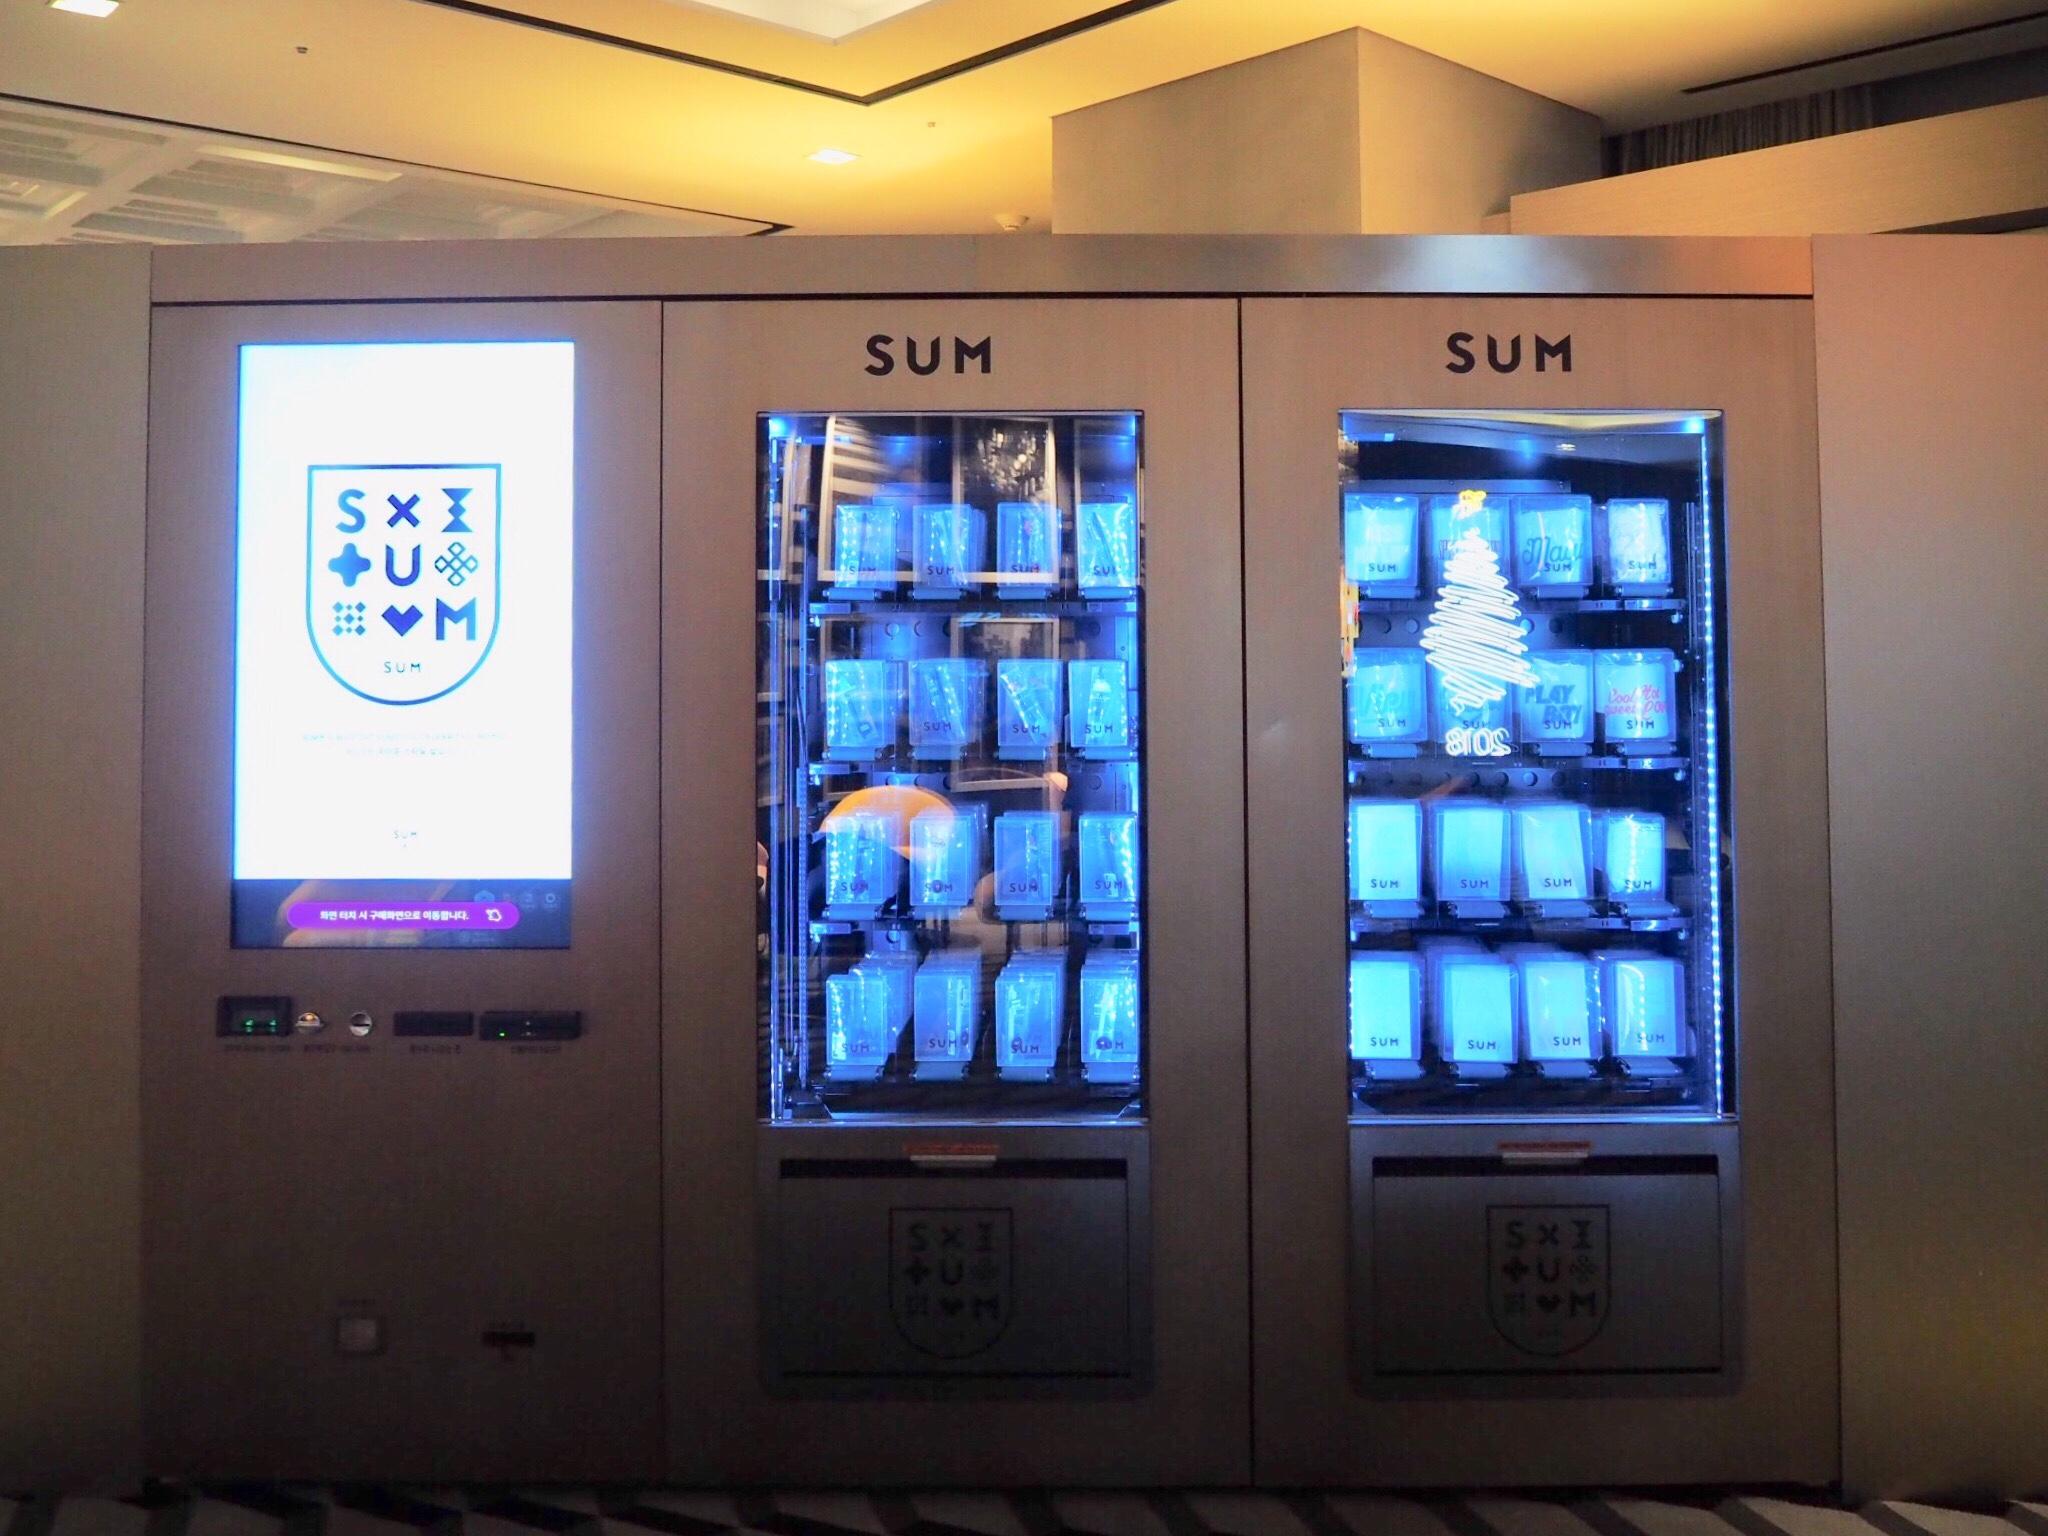 47eedeb5 d6a0 466d 8c14 82ce4e73e7fd - L7 HOTELS - どこを切り取ってもフォトジェニック!韓国ソウルに新しくオープンしたロッテグループのデザイナーズホテル